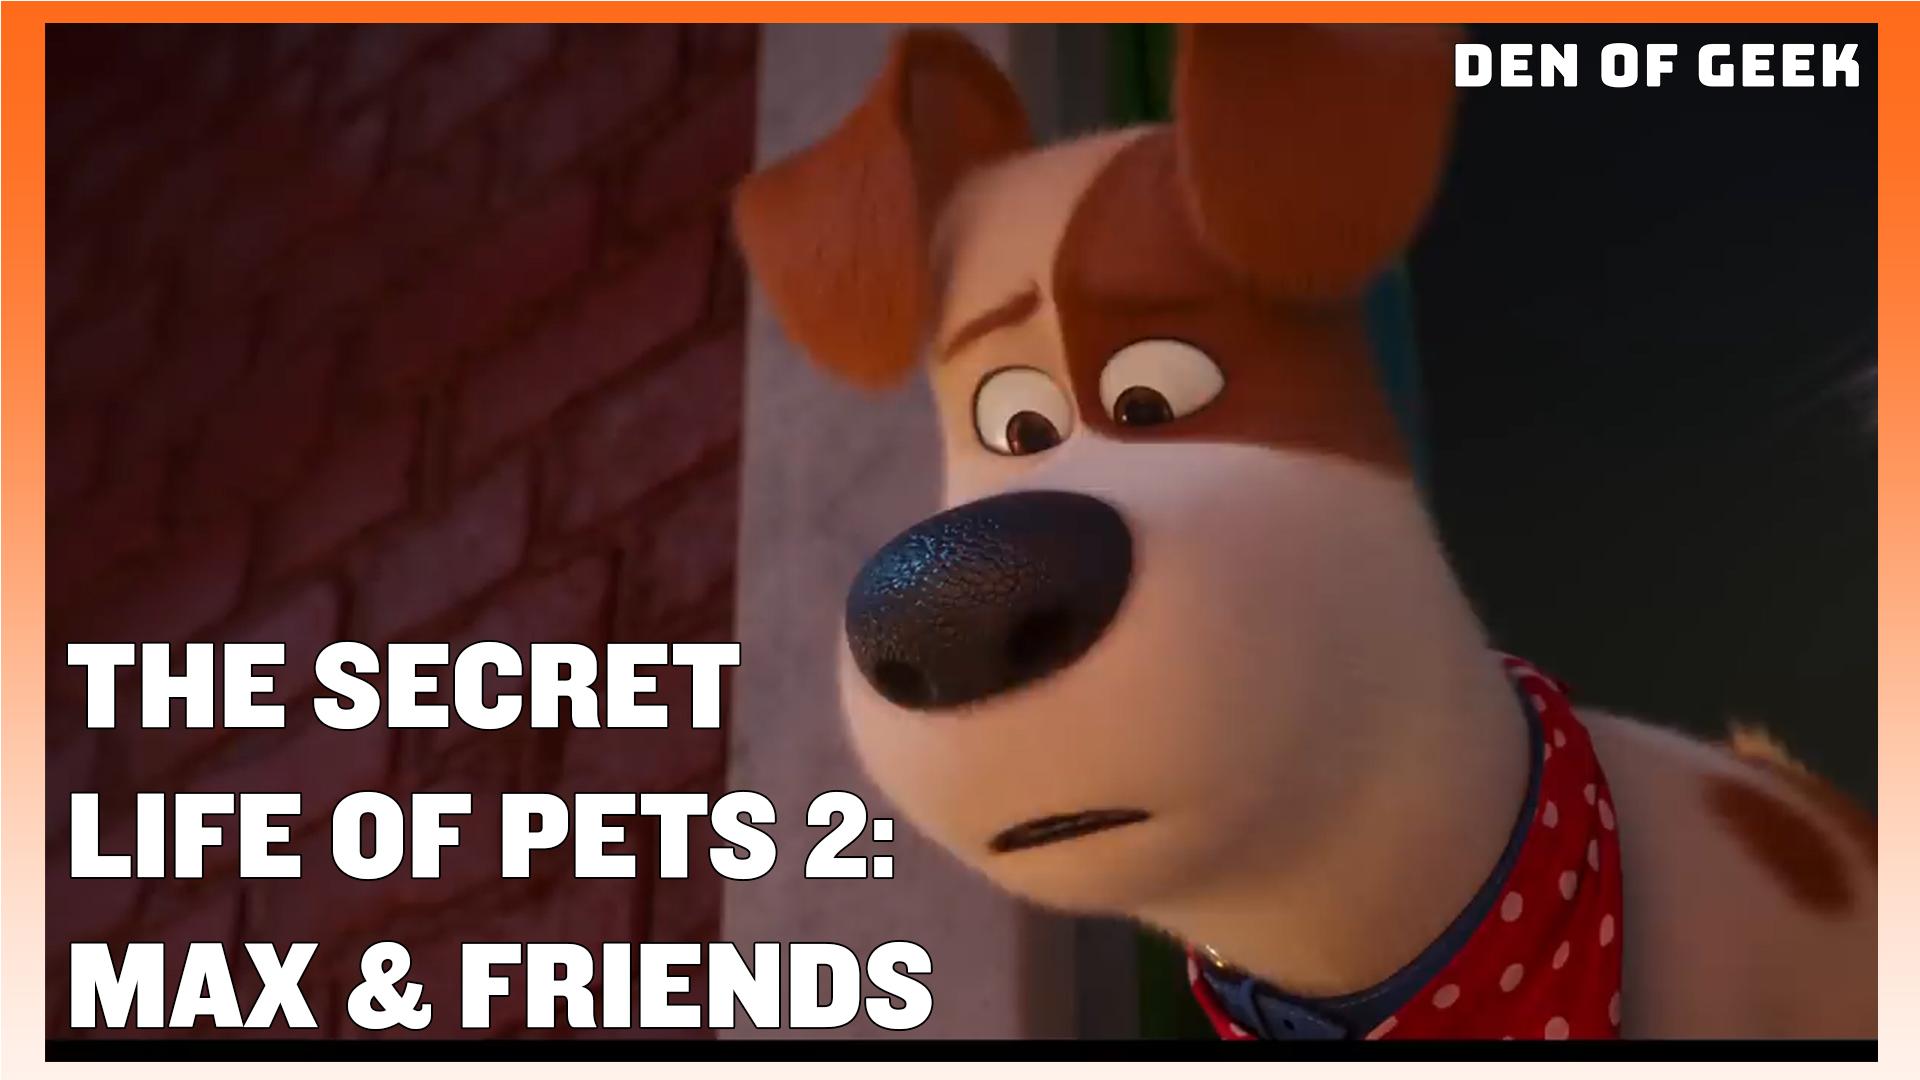 The Secret Life of Pets 2 - Oswalt, Slate, and Carvey Interview